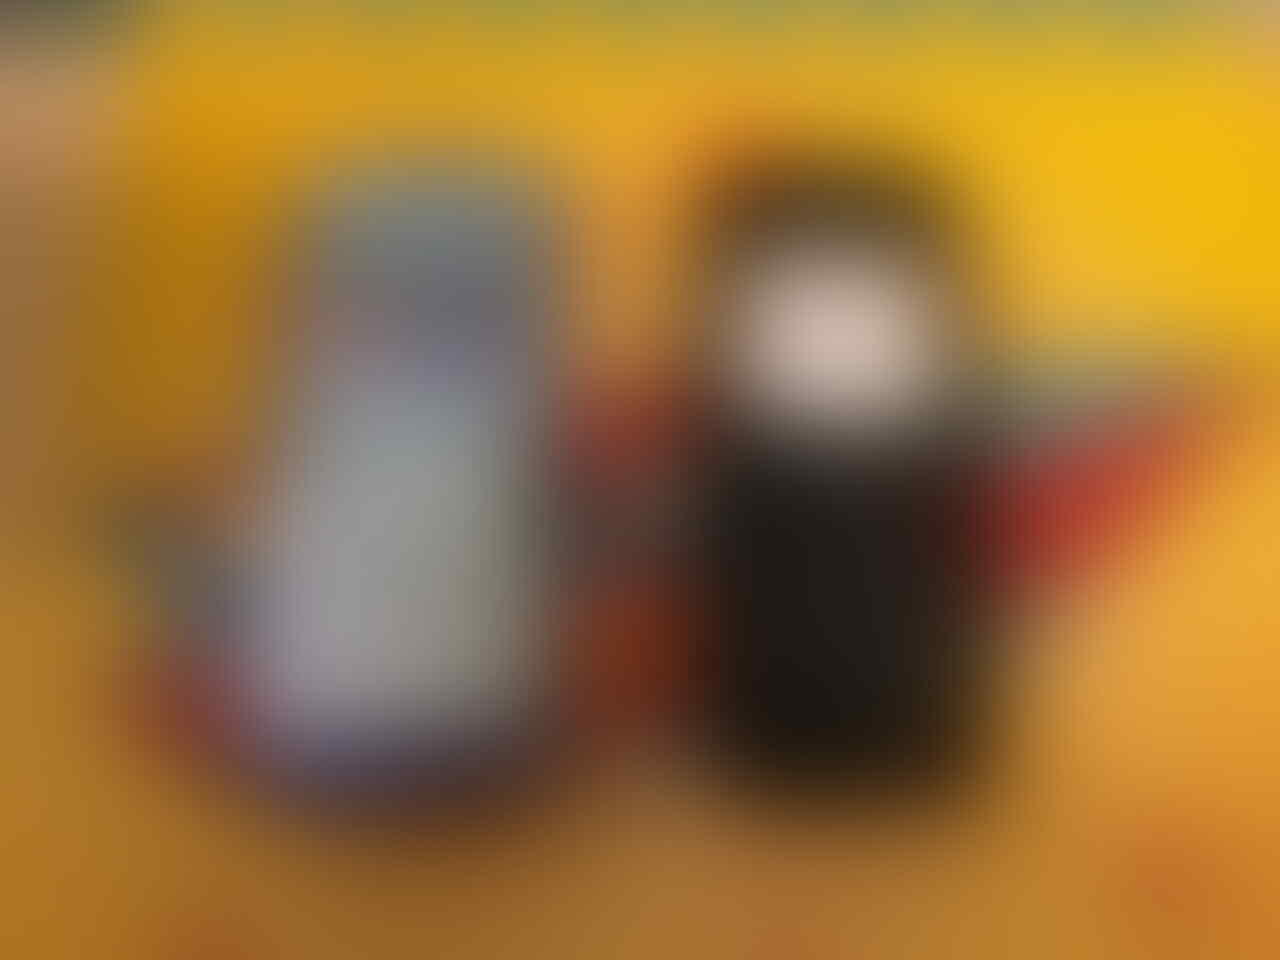 jual Sony ericsson T600,nokia 3100,nokia 6070 jember